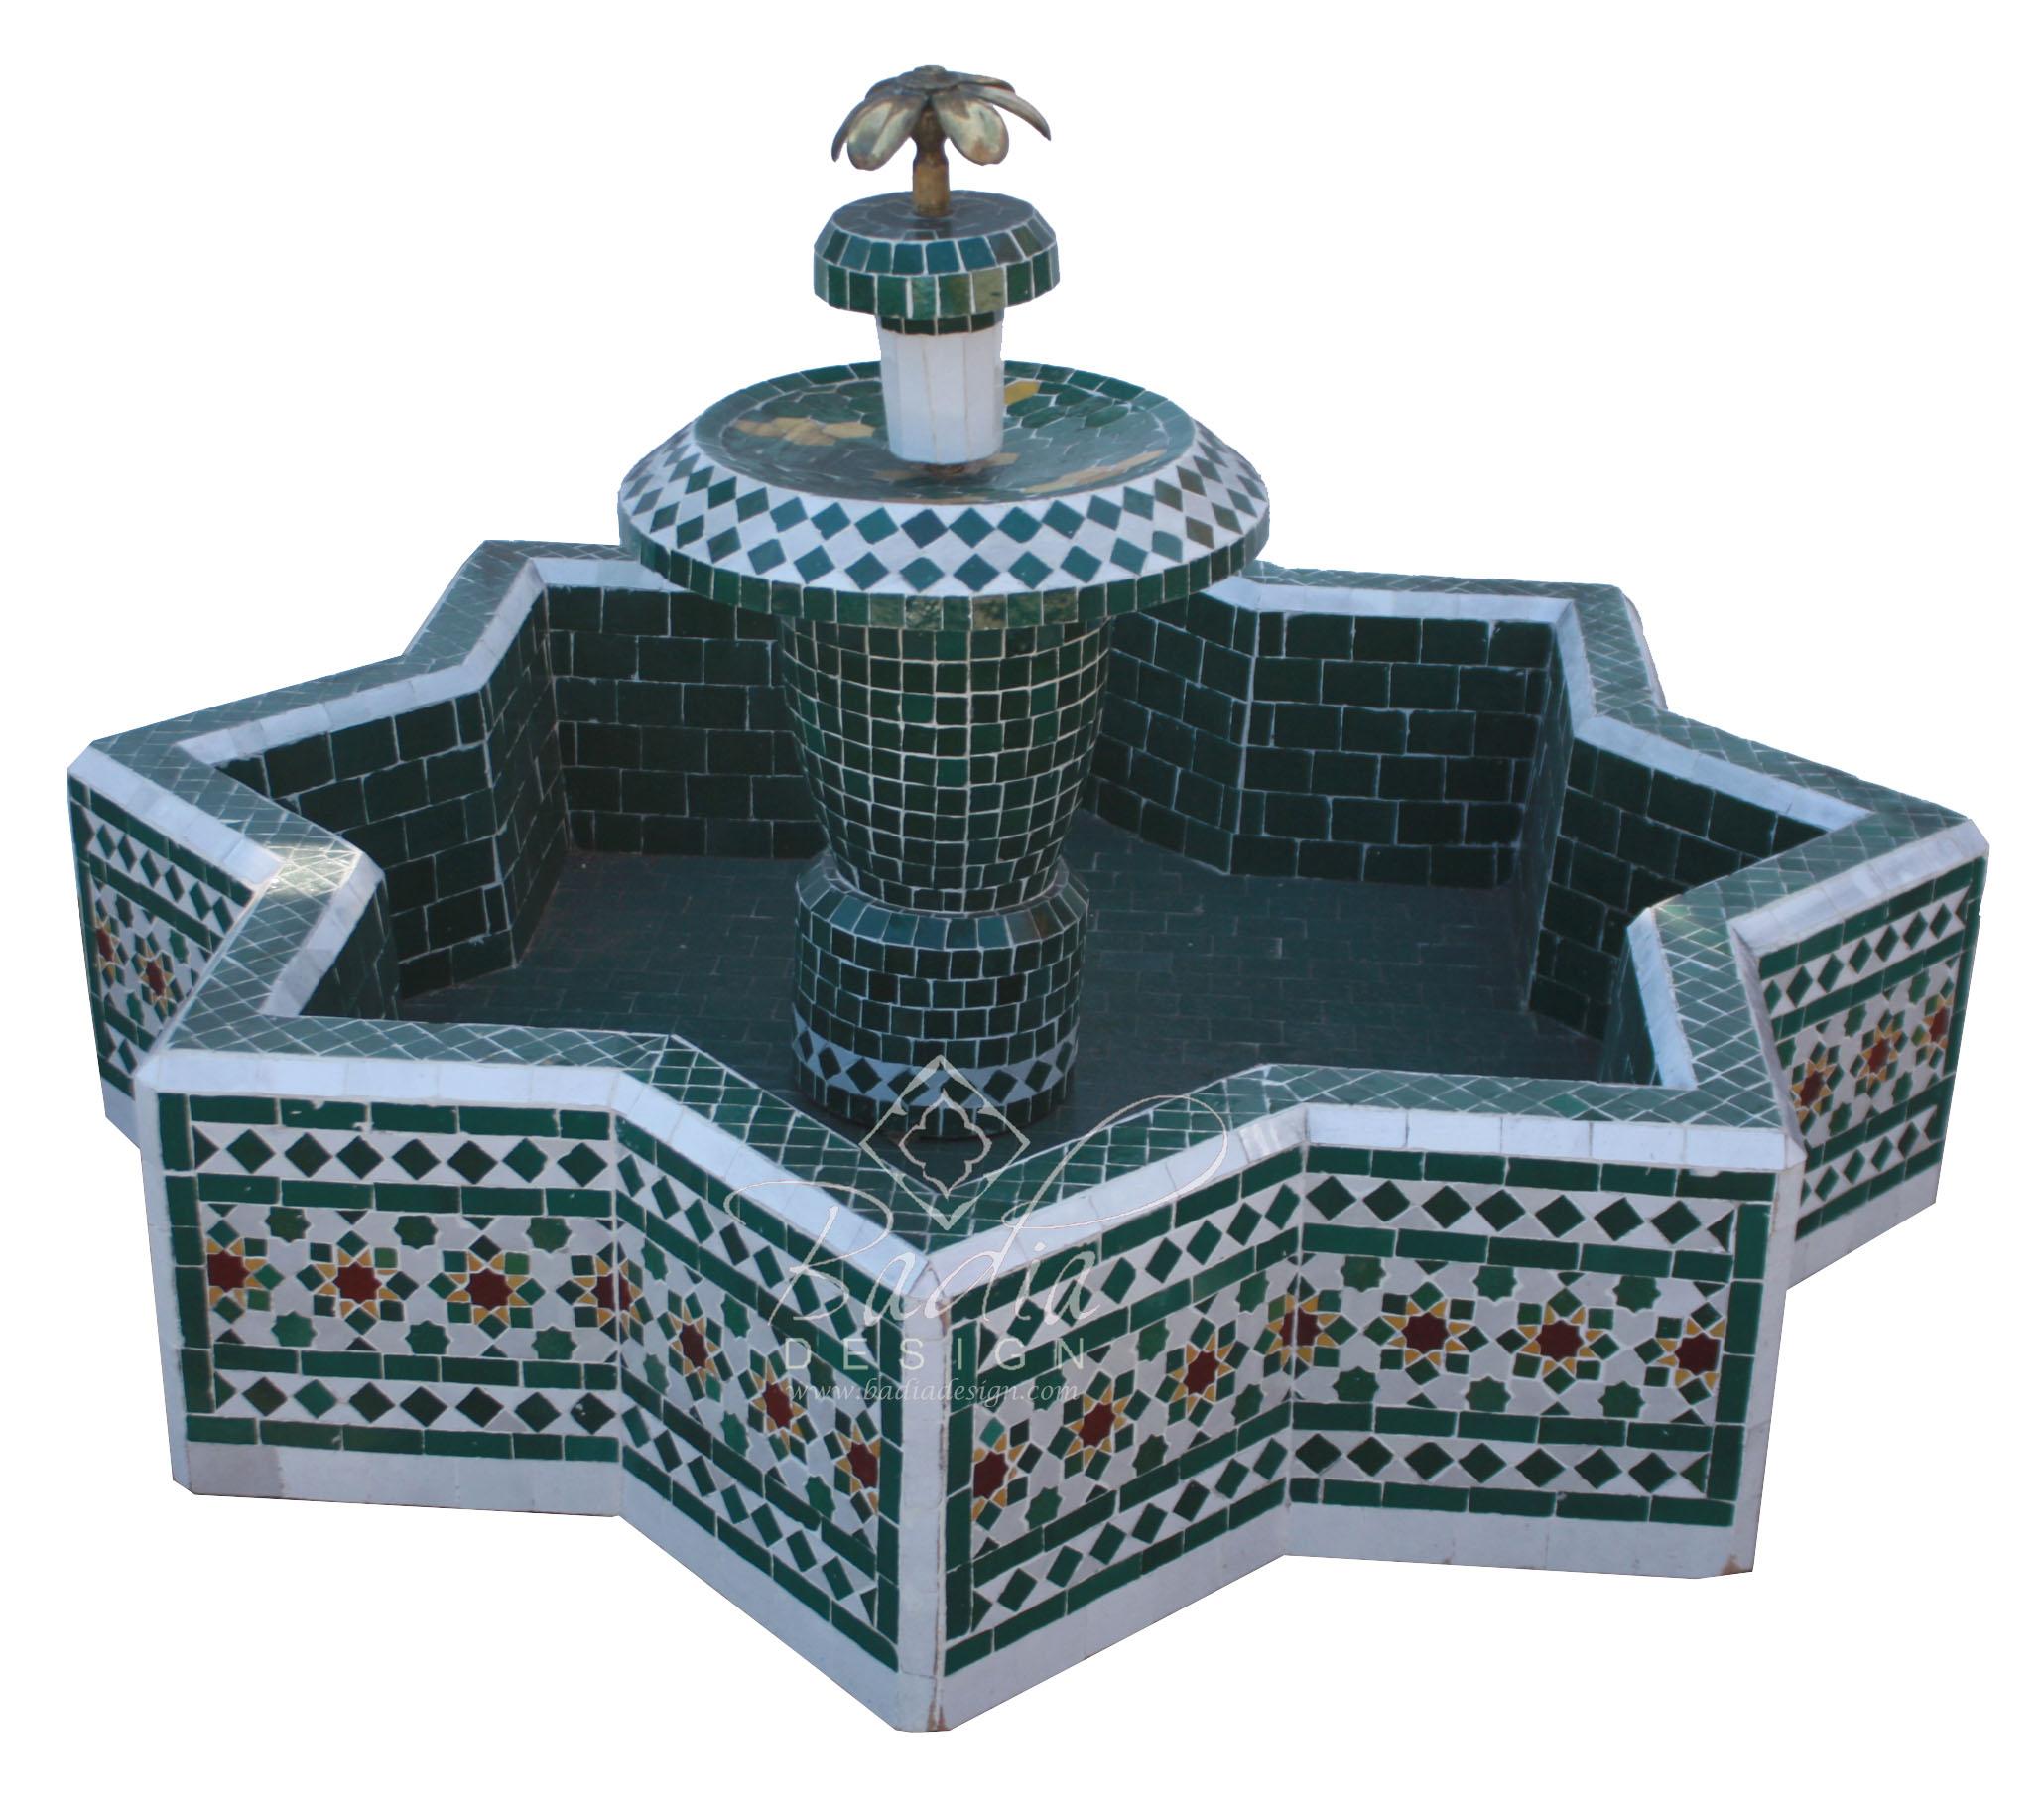 moroccan-star-shaped-green-floor-water-fountain-mf682-1.jpg